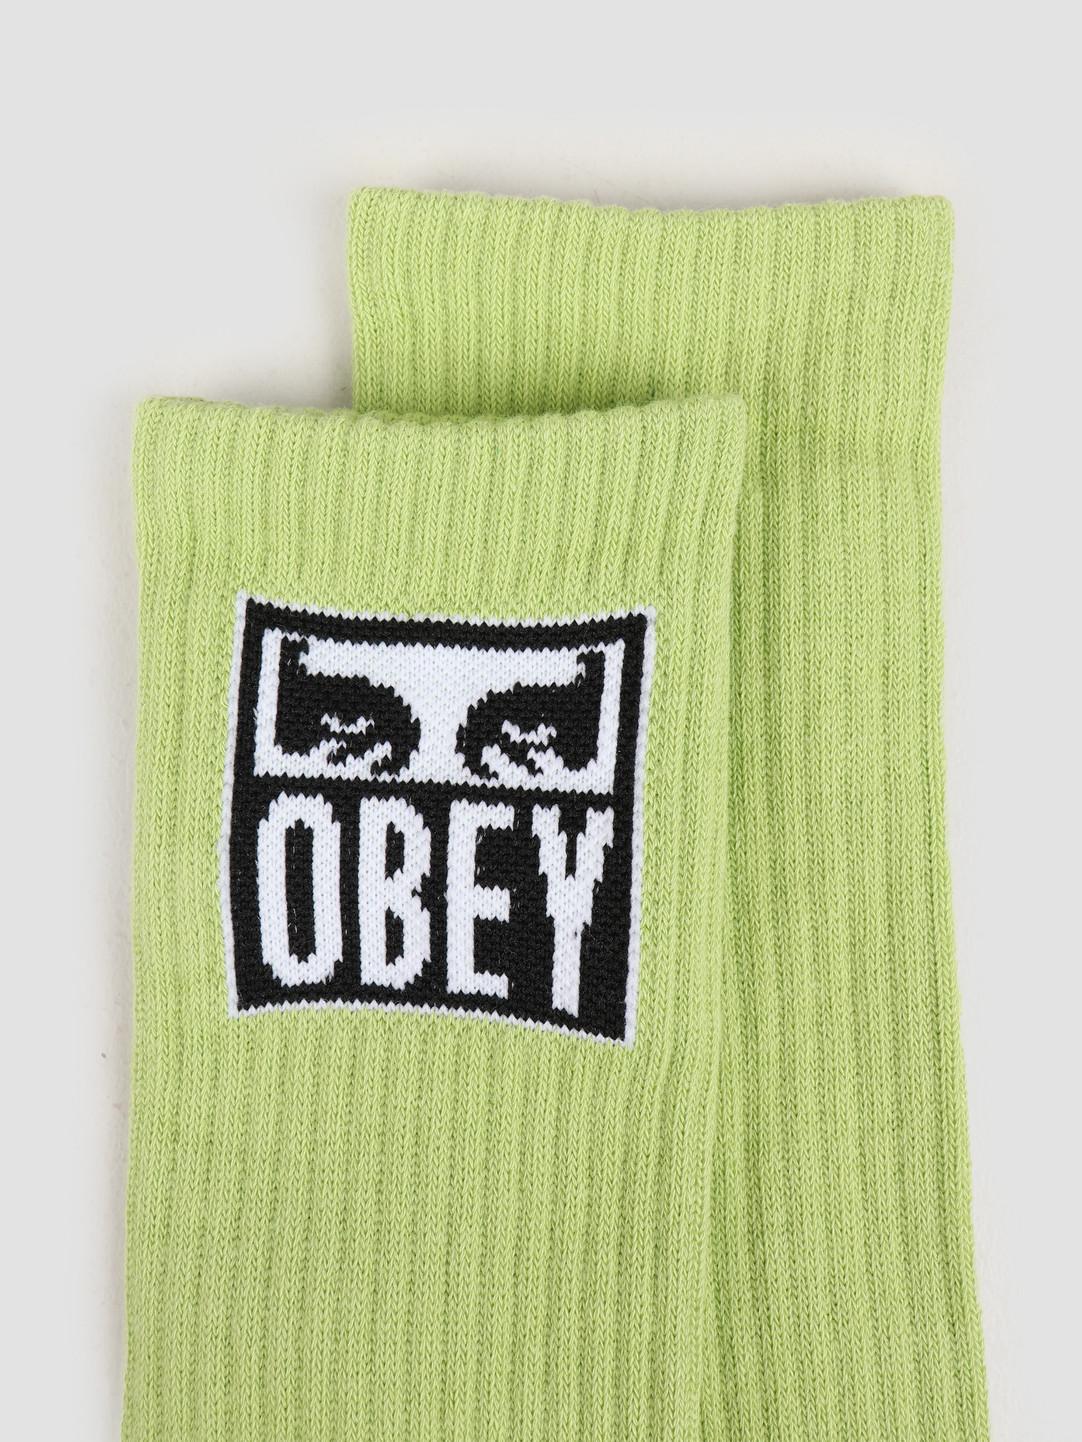 Obey Obey Obey eyes icon socks Key lime 100260141 KEY